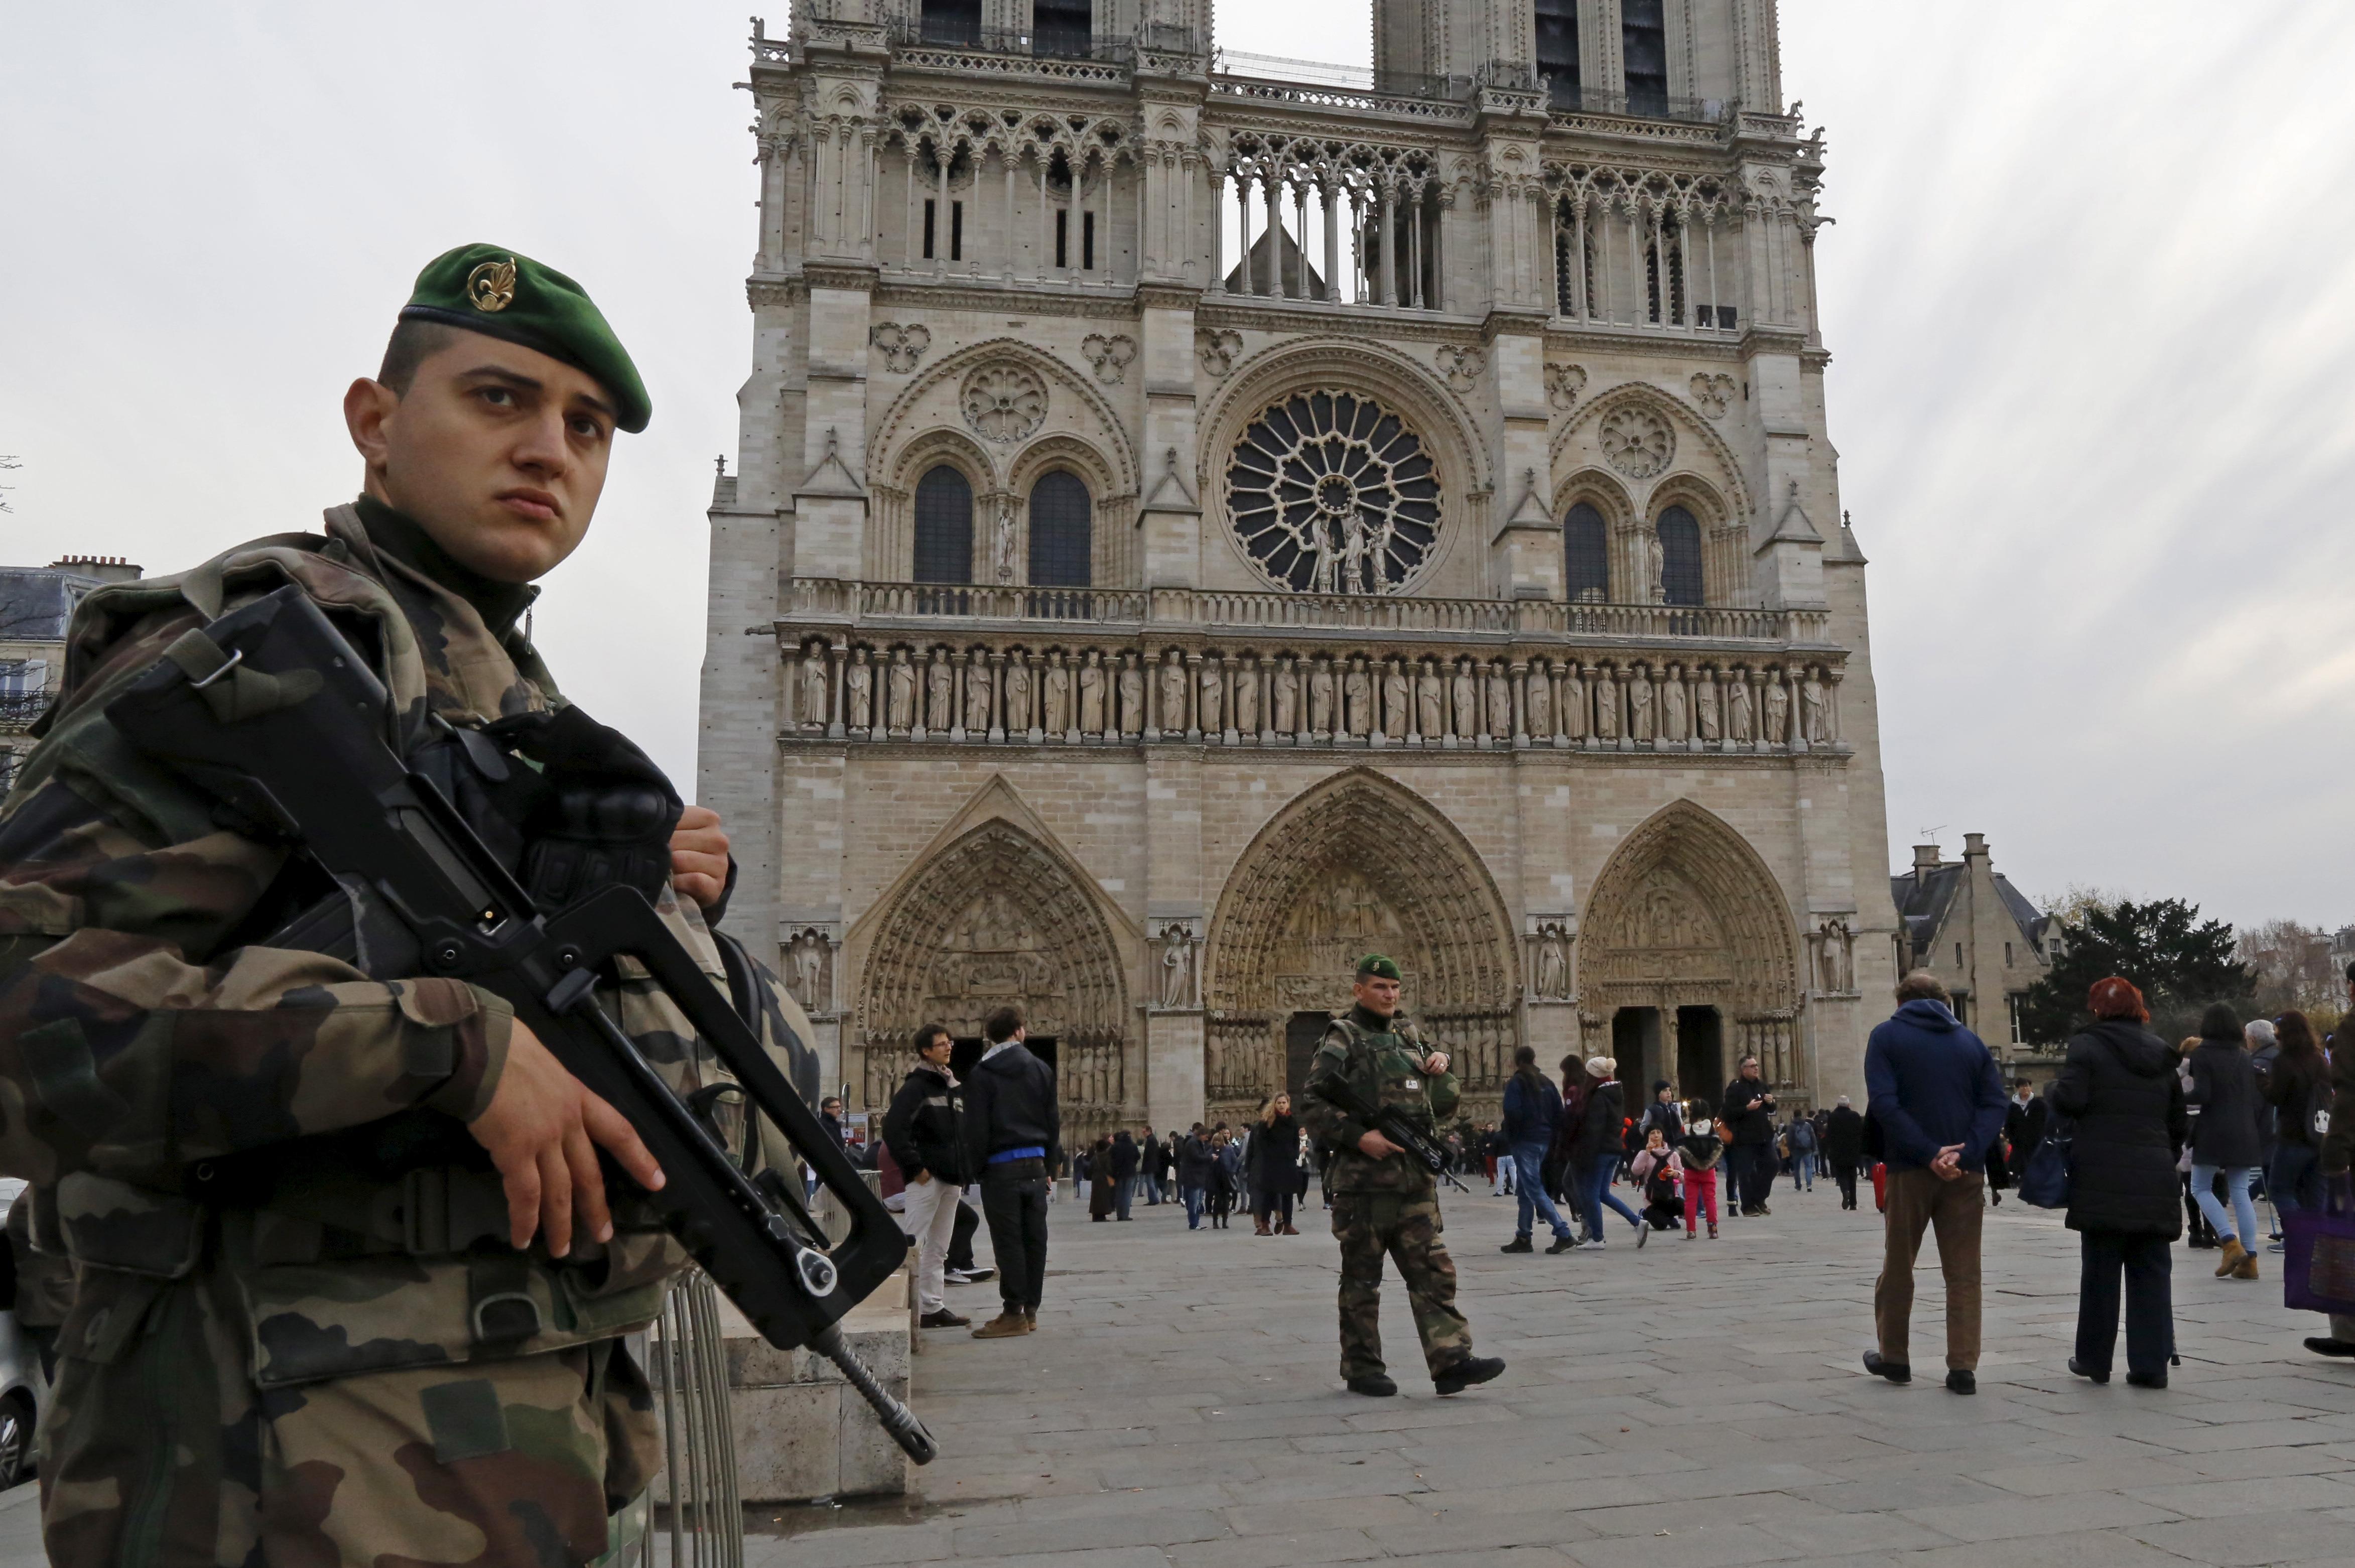 France tightens church security for Christmas - CBS News 068a0e628